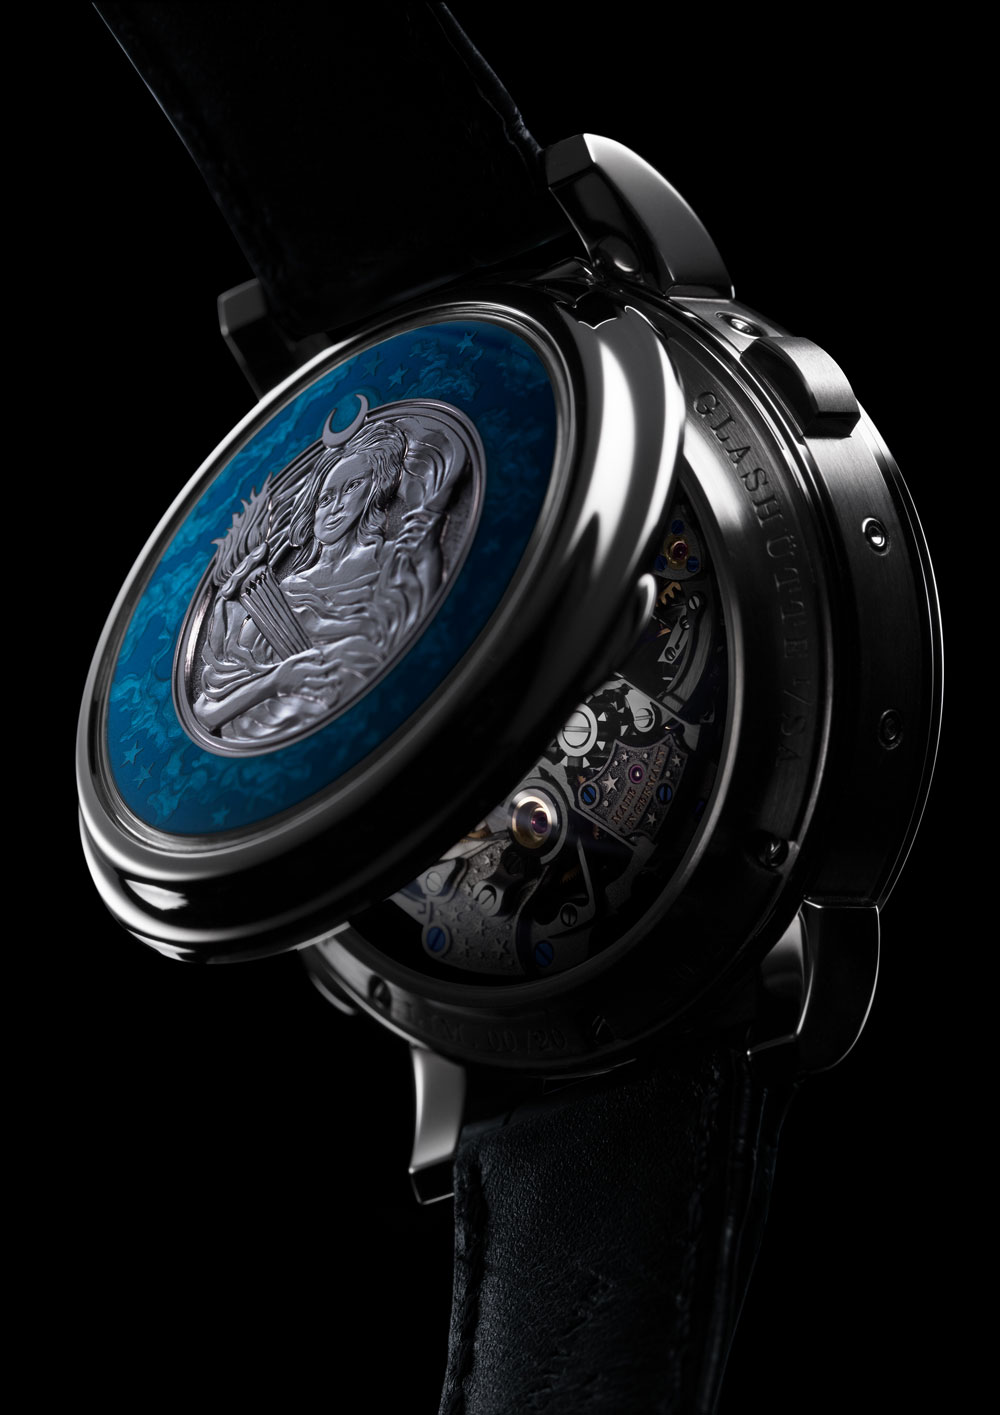 Tapa reloj 1815 Ratrapante Calendario Perpetuo Handwerkskunst de A. Lange & Söhne